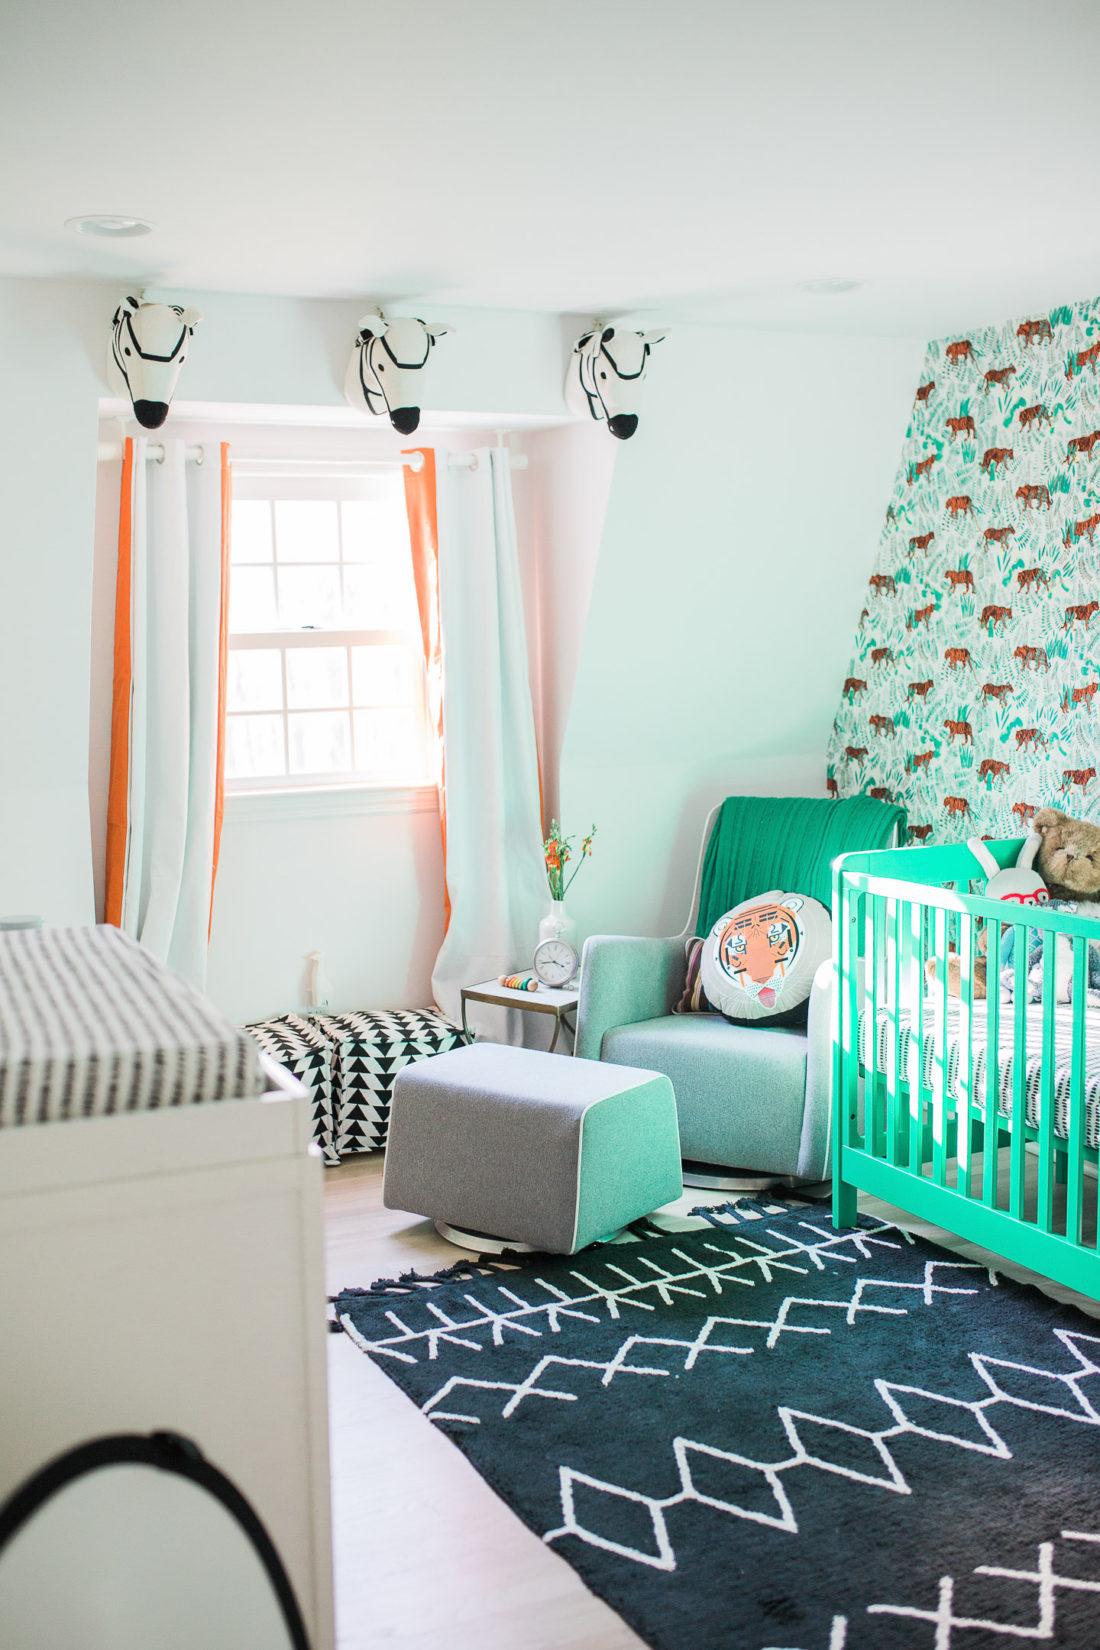 Nursery designed by Eva Amurri Martino of lifestyle and motherhood blog Happily Eva After for her newborn son, Major